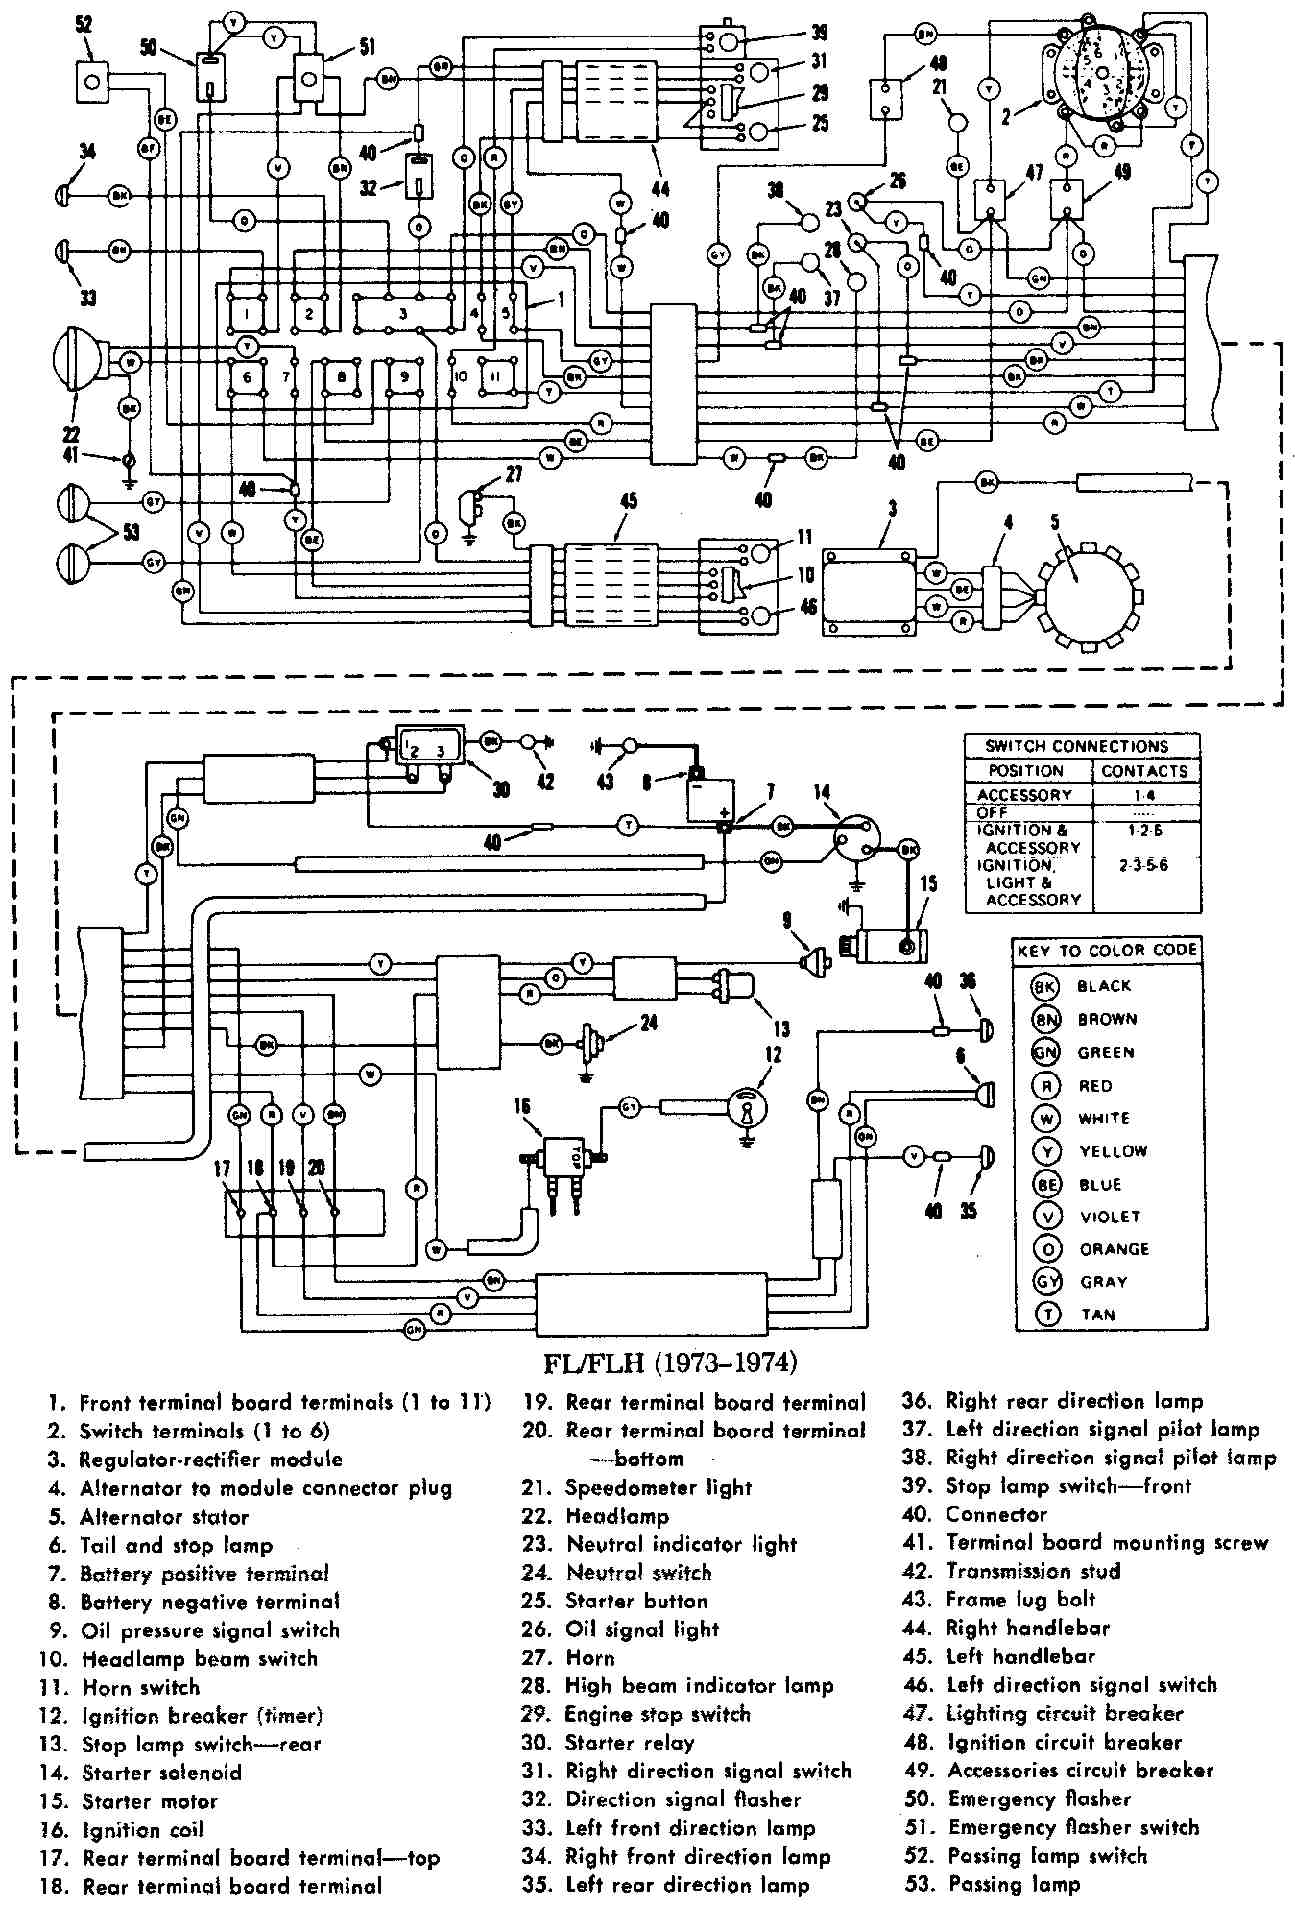 1968 amc amx starter wiring diagram pontiac fiero wiring diagram